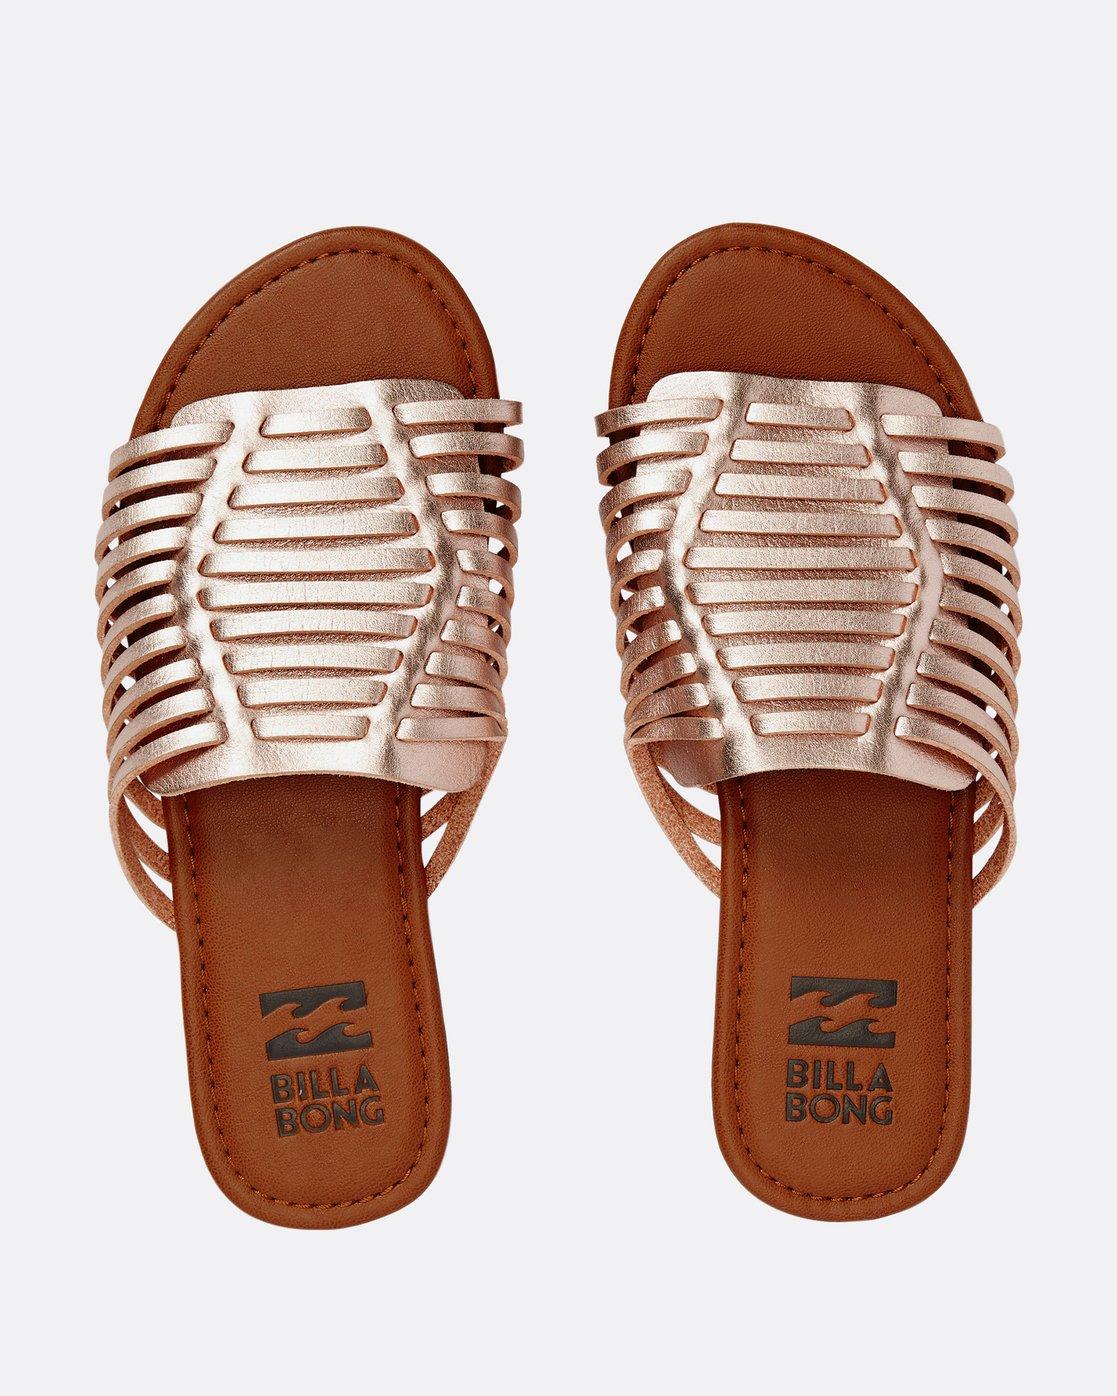 fe79fc554 0 Tread Lightly Sandal Pink JFOTNBTR Billabong